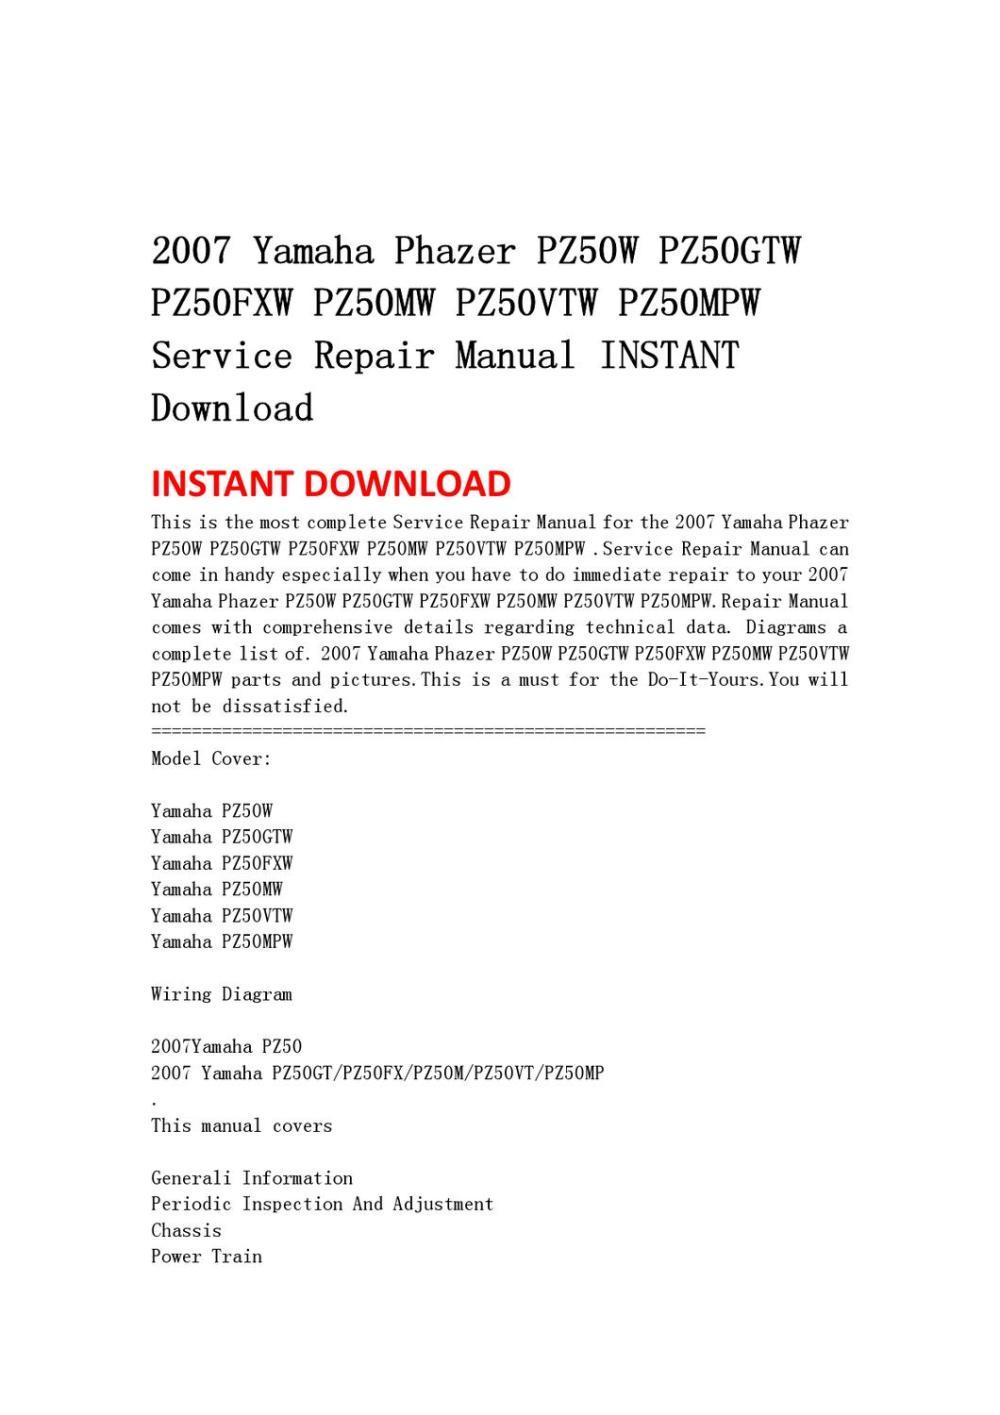 medium resolution of 2007 yamaha phazer pz50w pz50gtw pz50fxw pz50mw pz50vtw pz50mpw 2007 yamaha phazer wiring diagrams